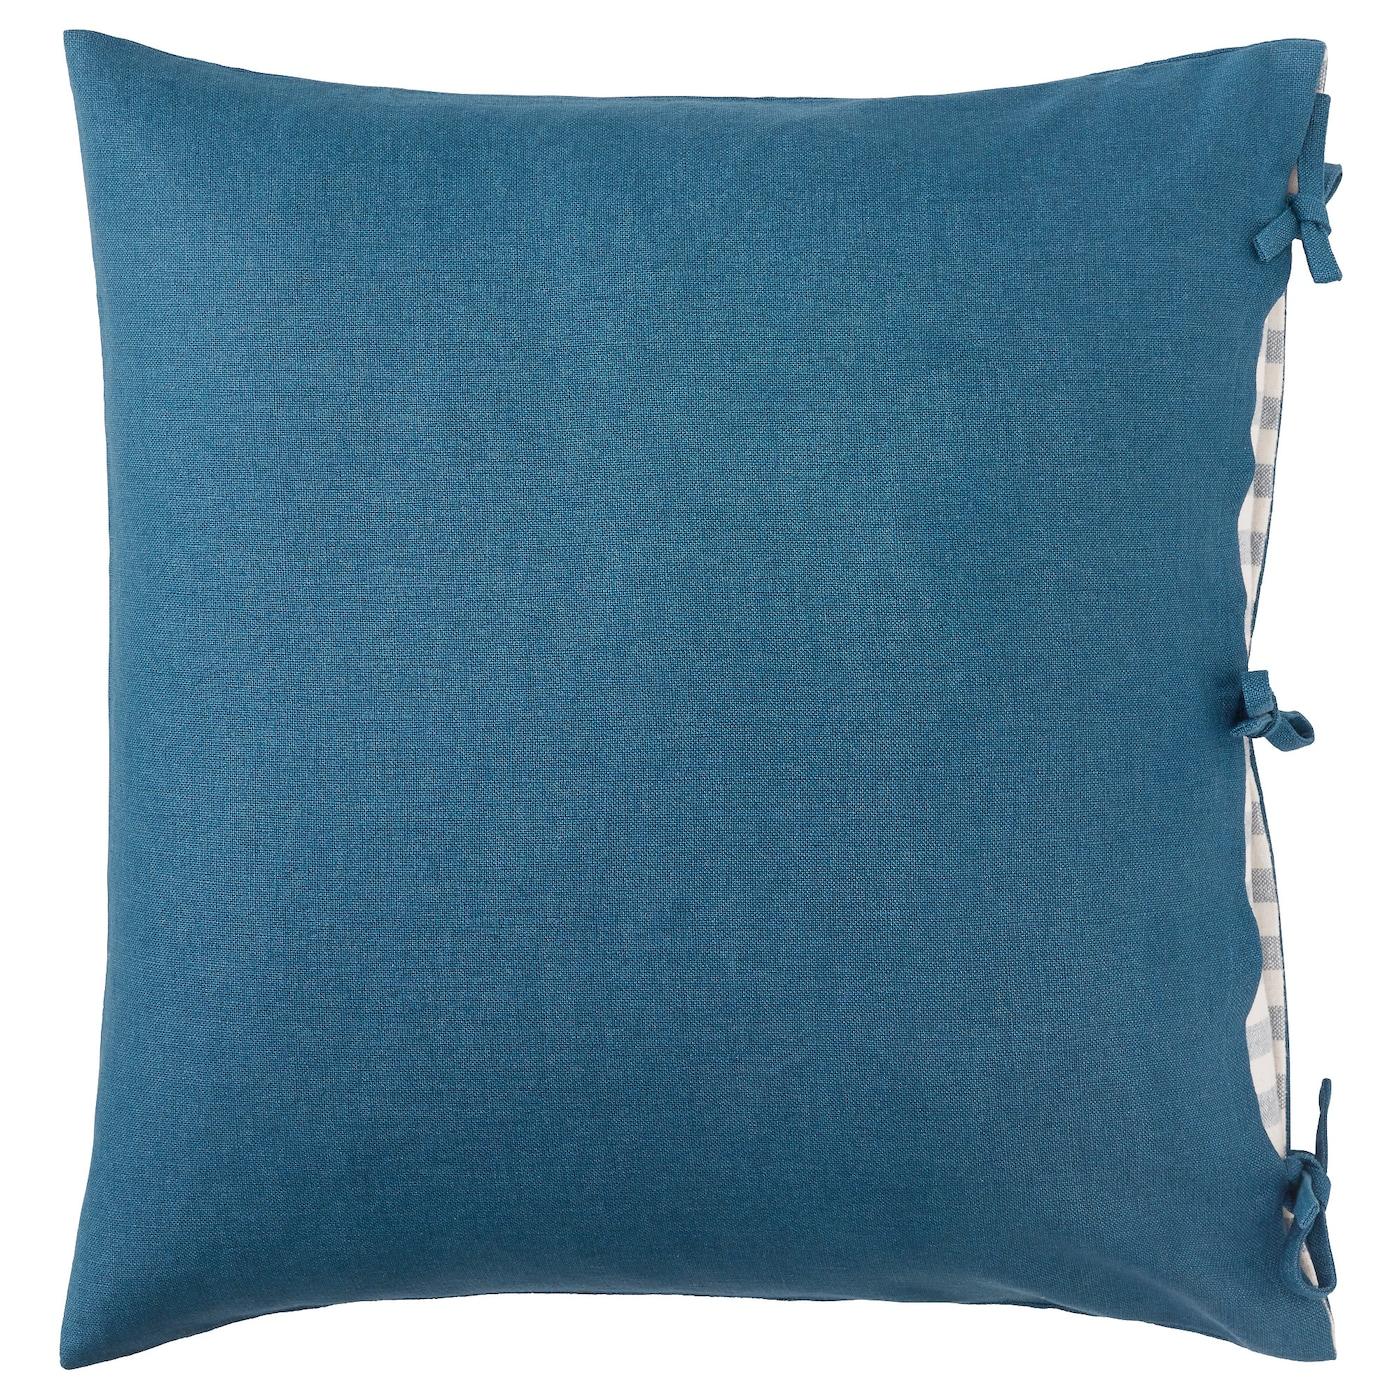 Cushion Covers & Cushion Covers